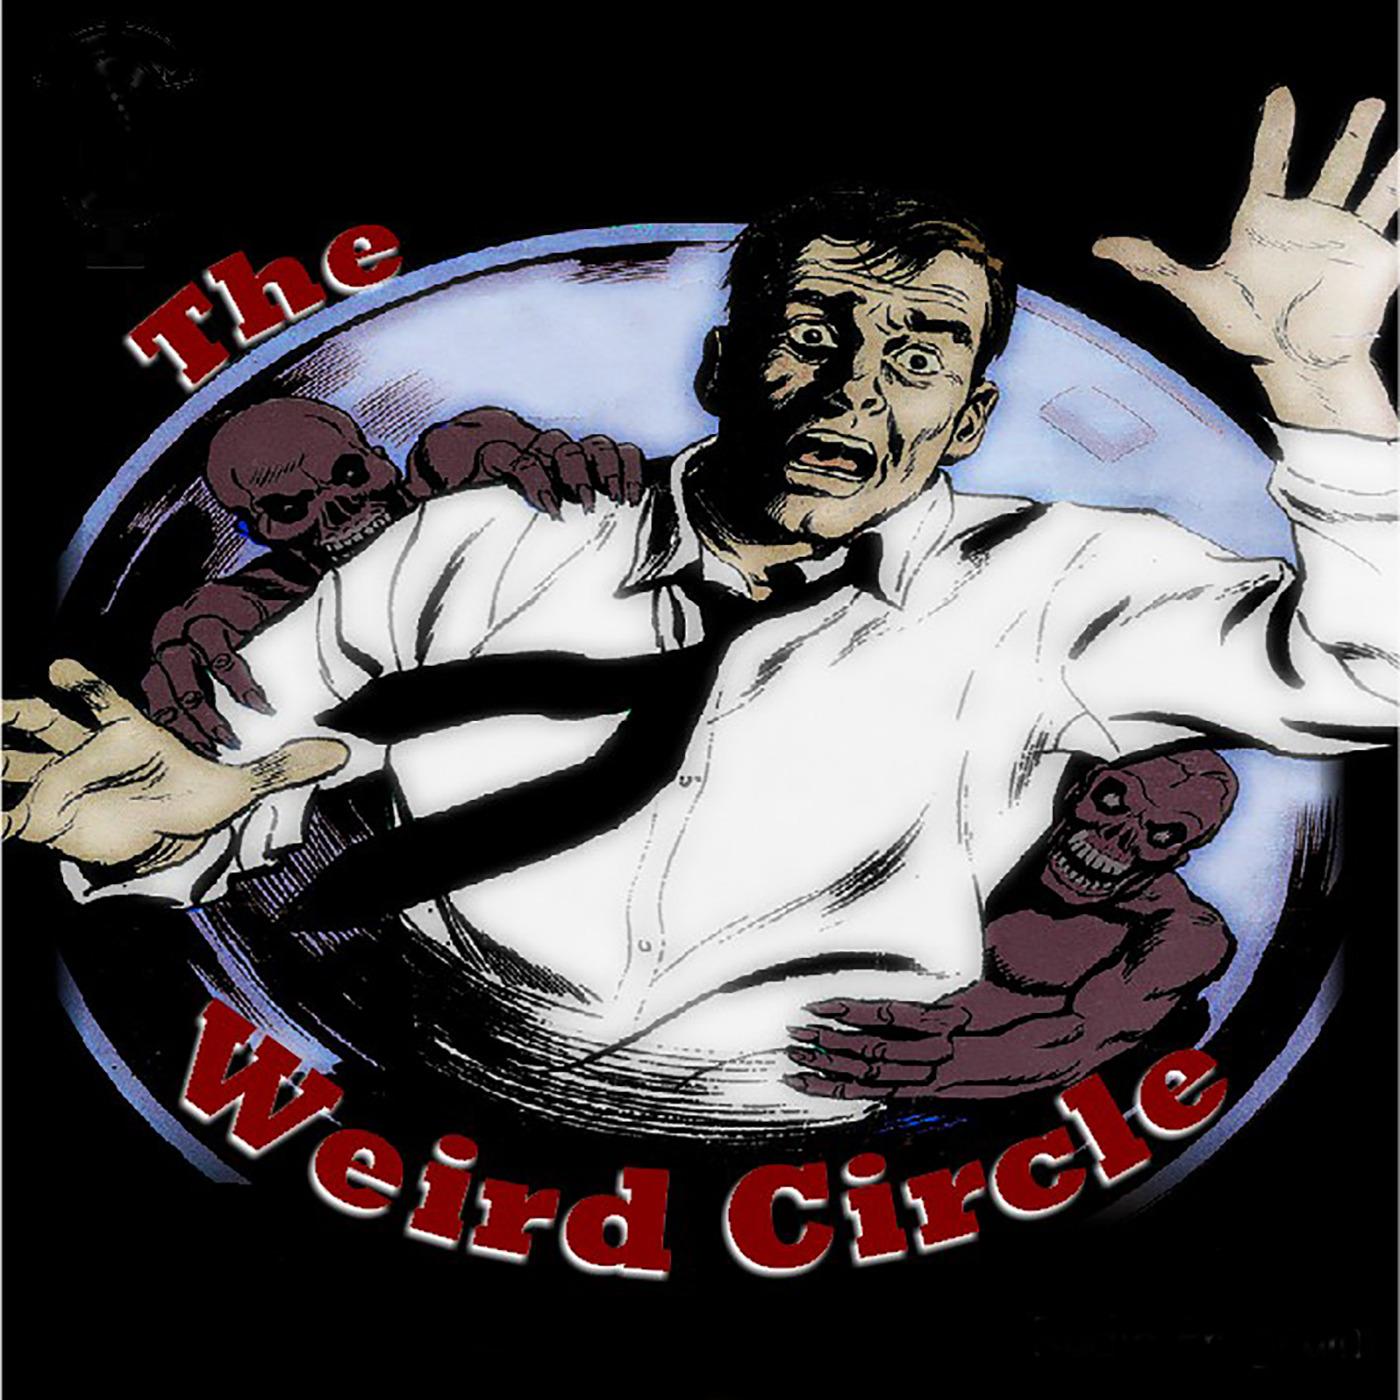 The Weird Circle